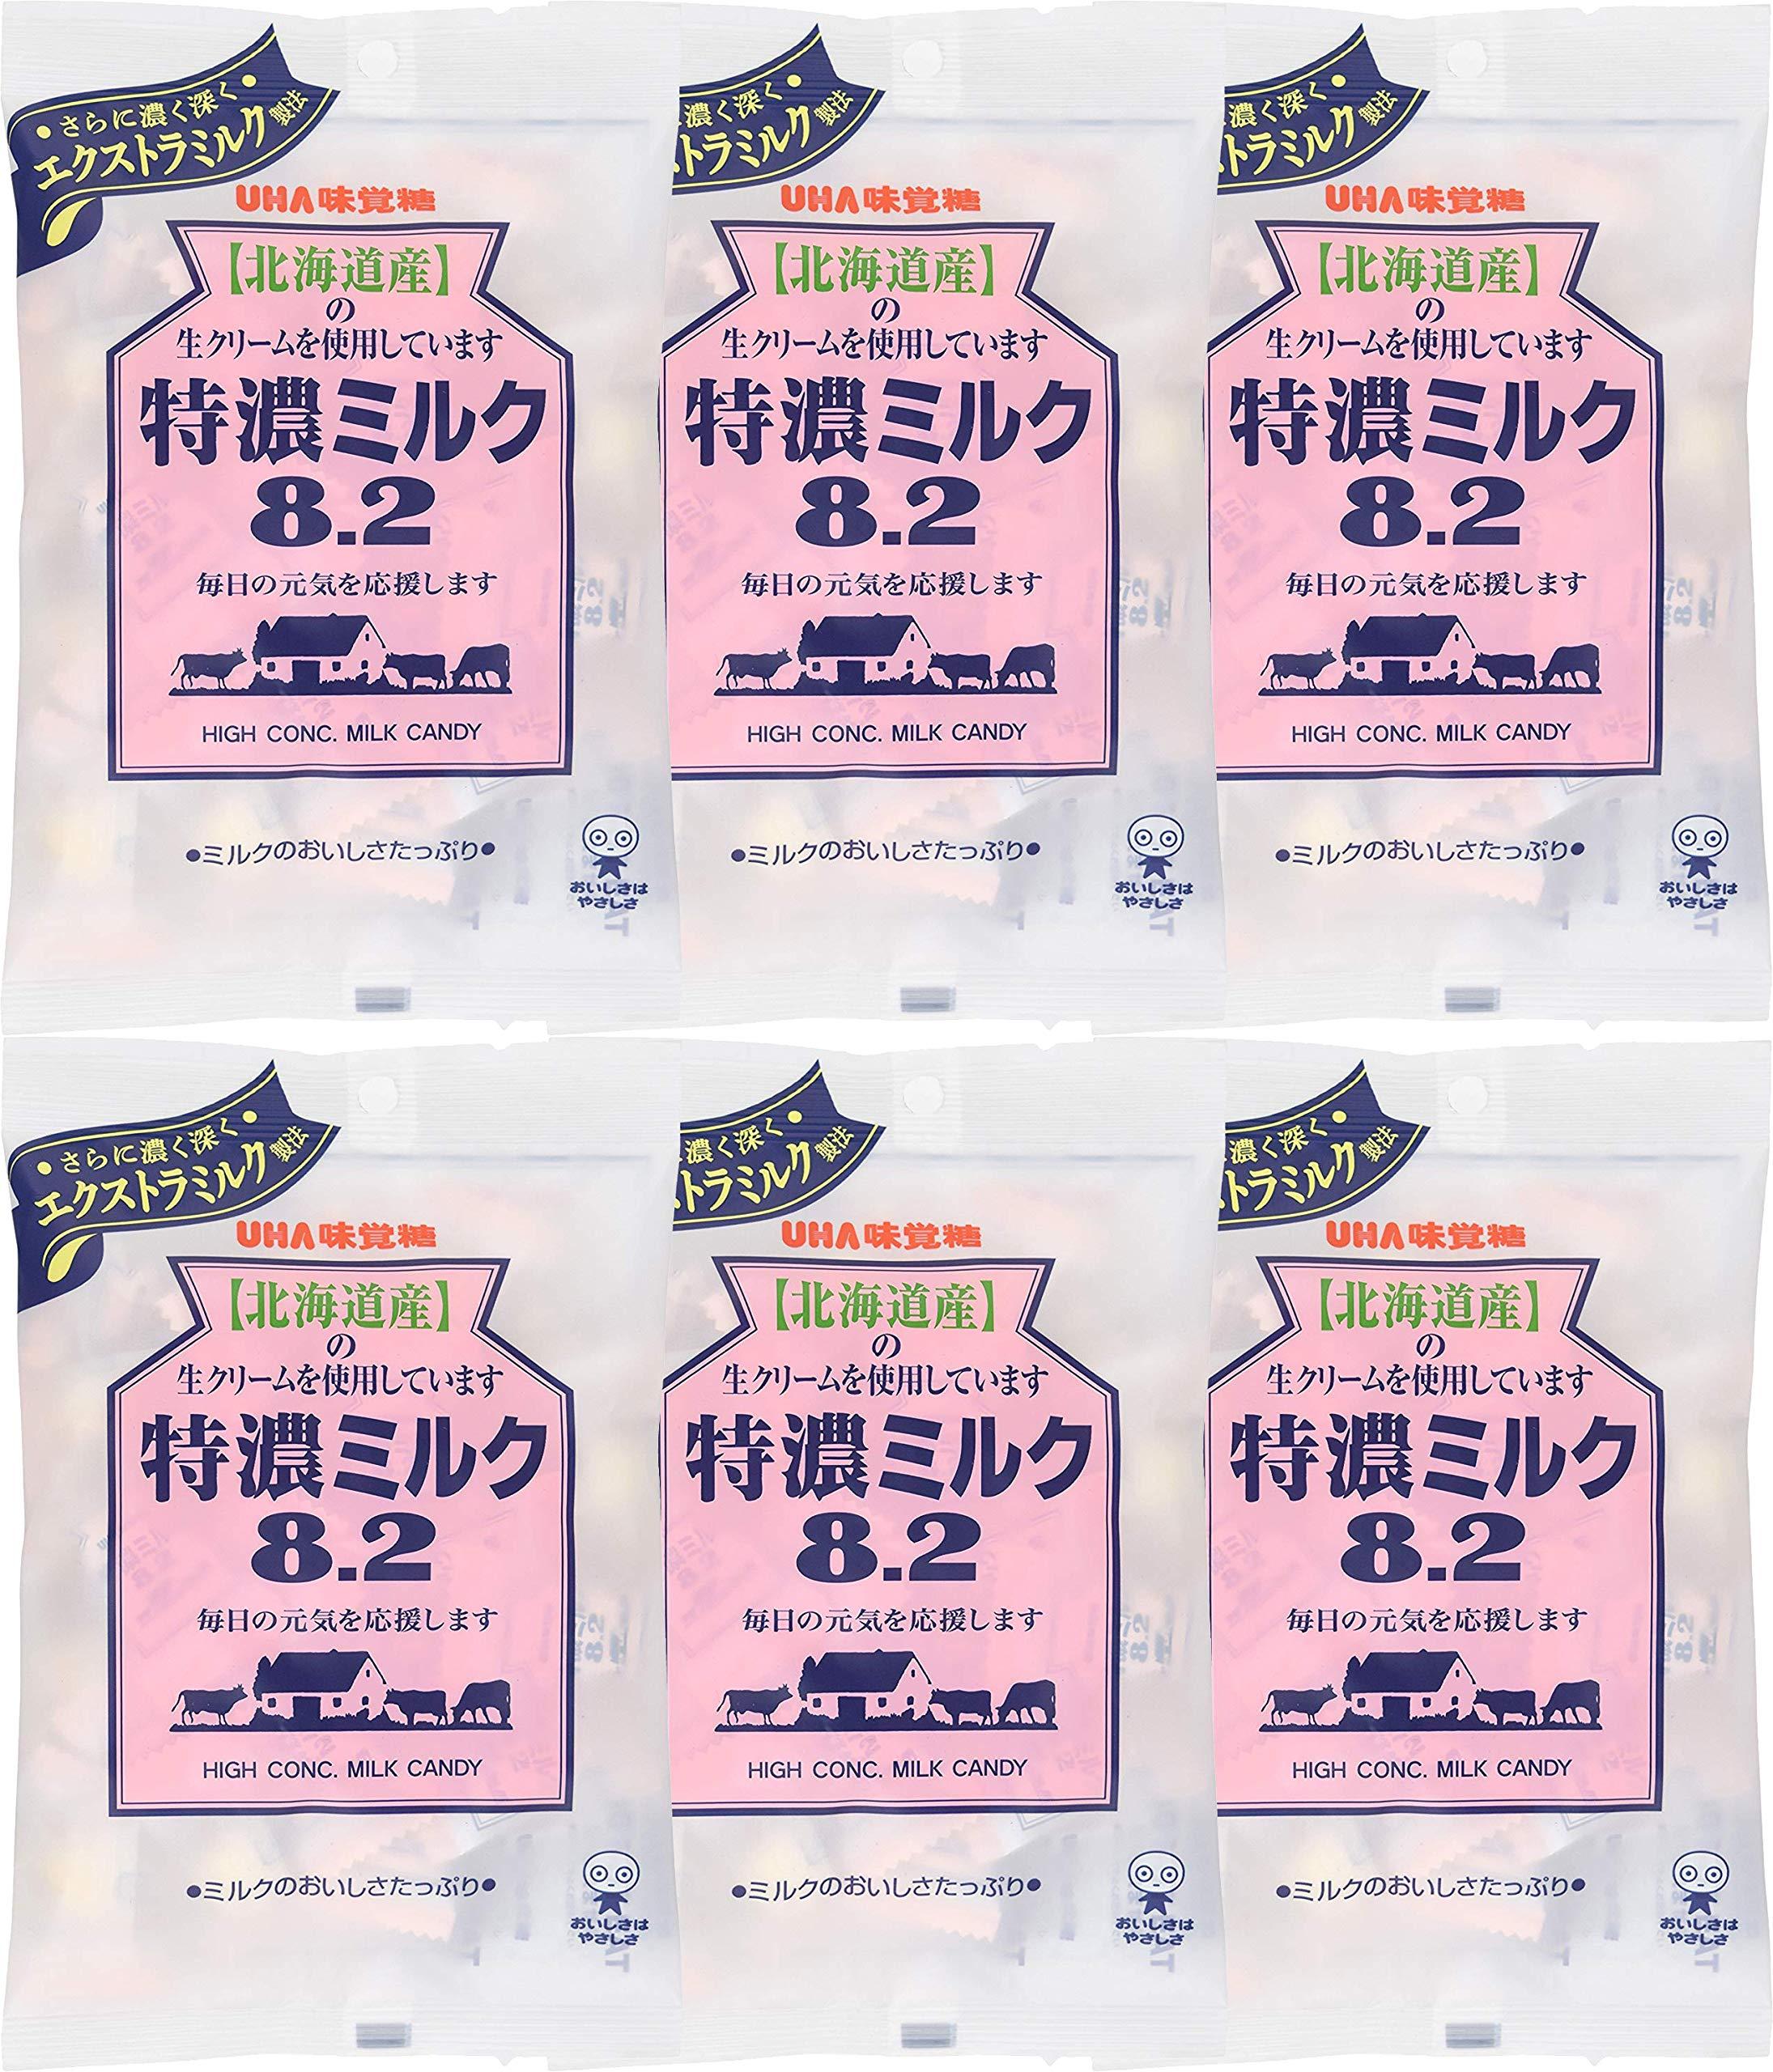 Mikakuto Tokuno Japanese Milk Candy, Bags (Pack of 6) JAPAN INPORT by UHA Mikakutou